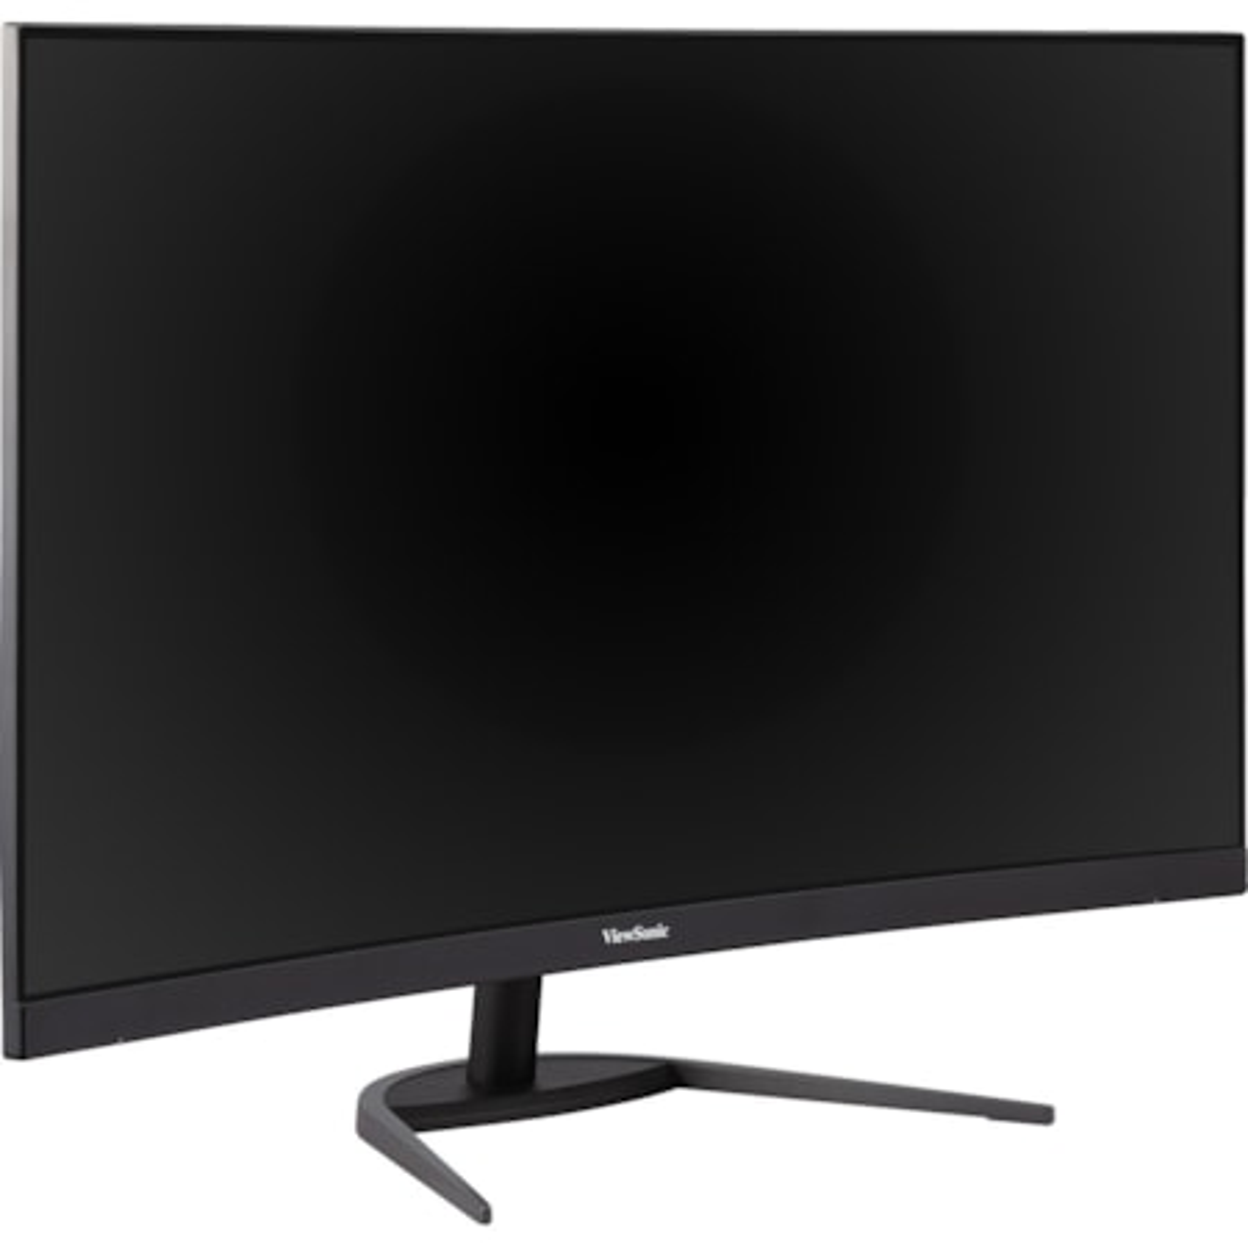 "Viewsonic VX3268-2KPC-MHD 80 cm (31.5"") WQHD LED Gaming LCD Monitor - 16:9"